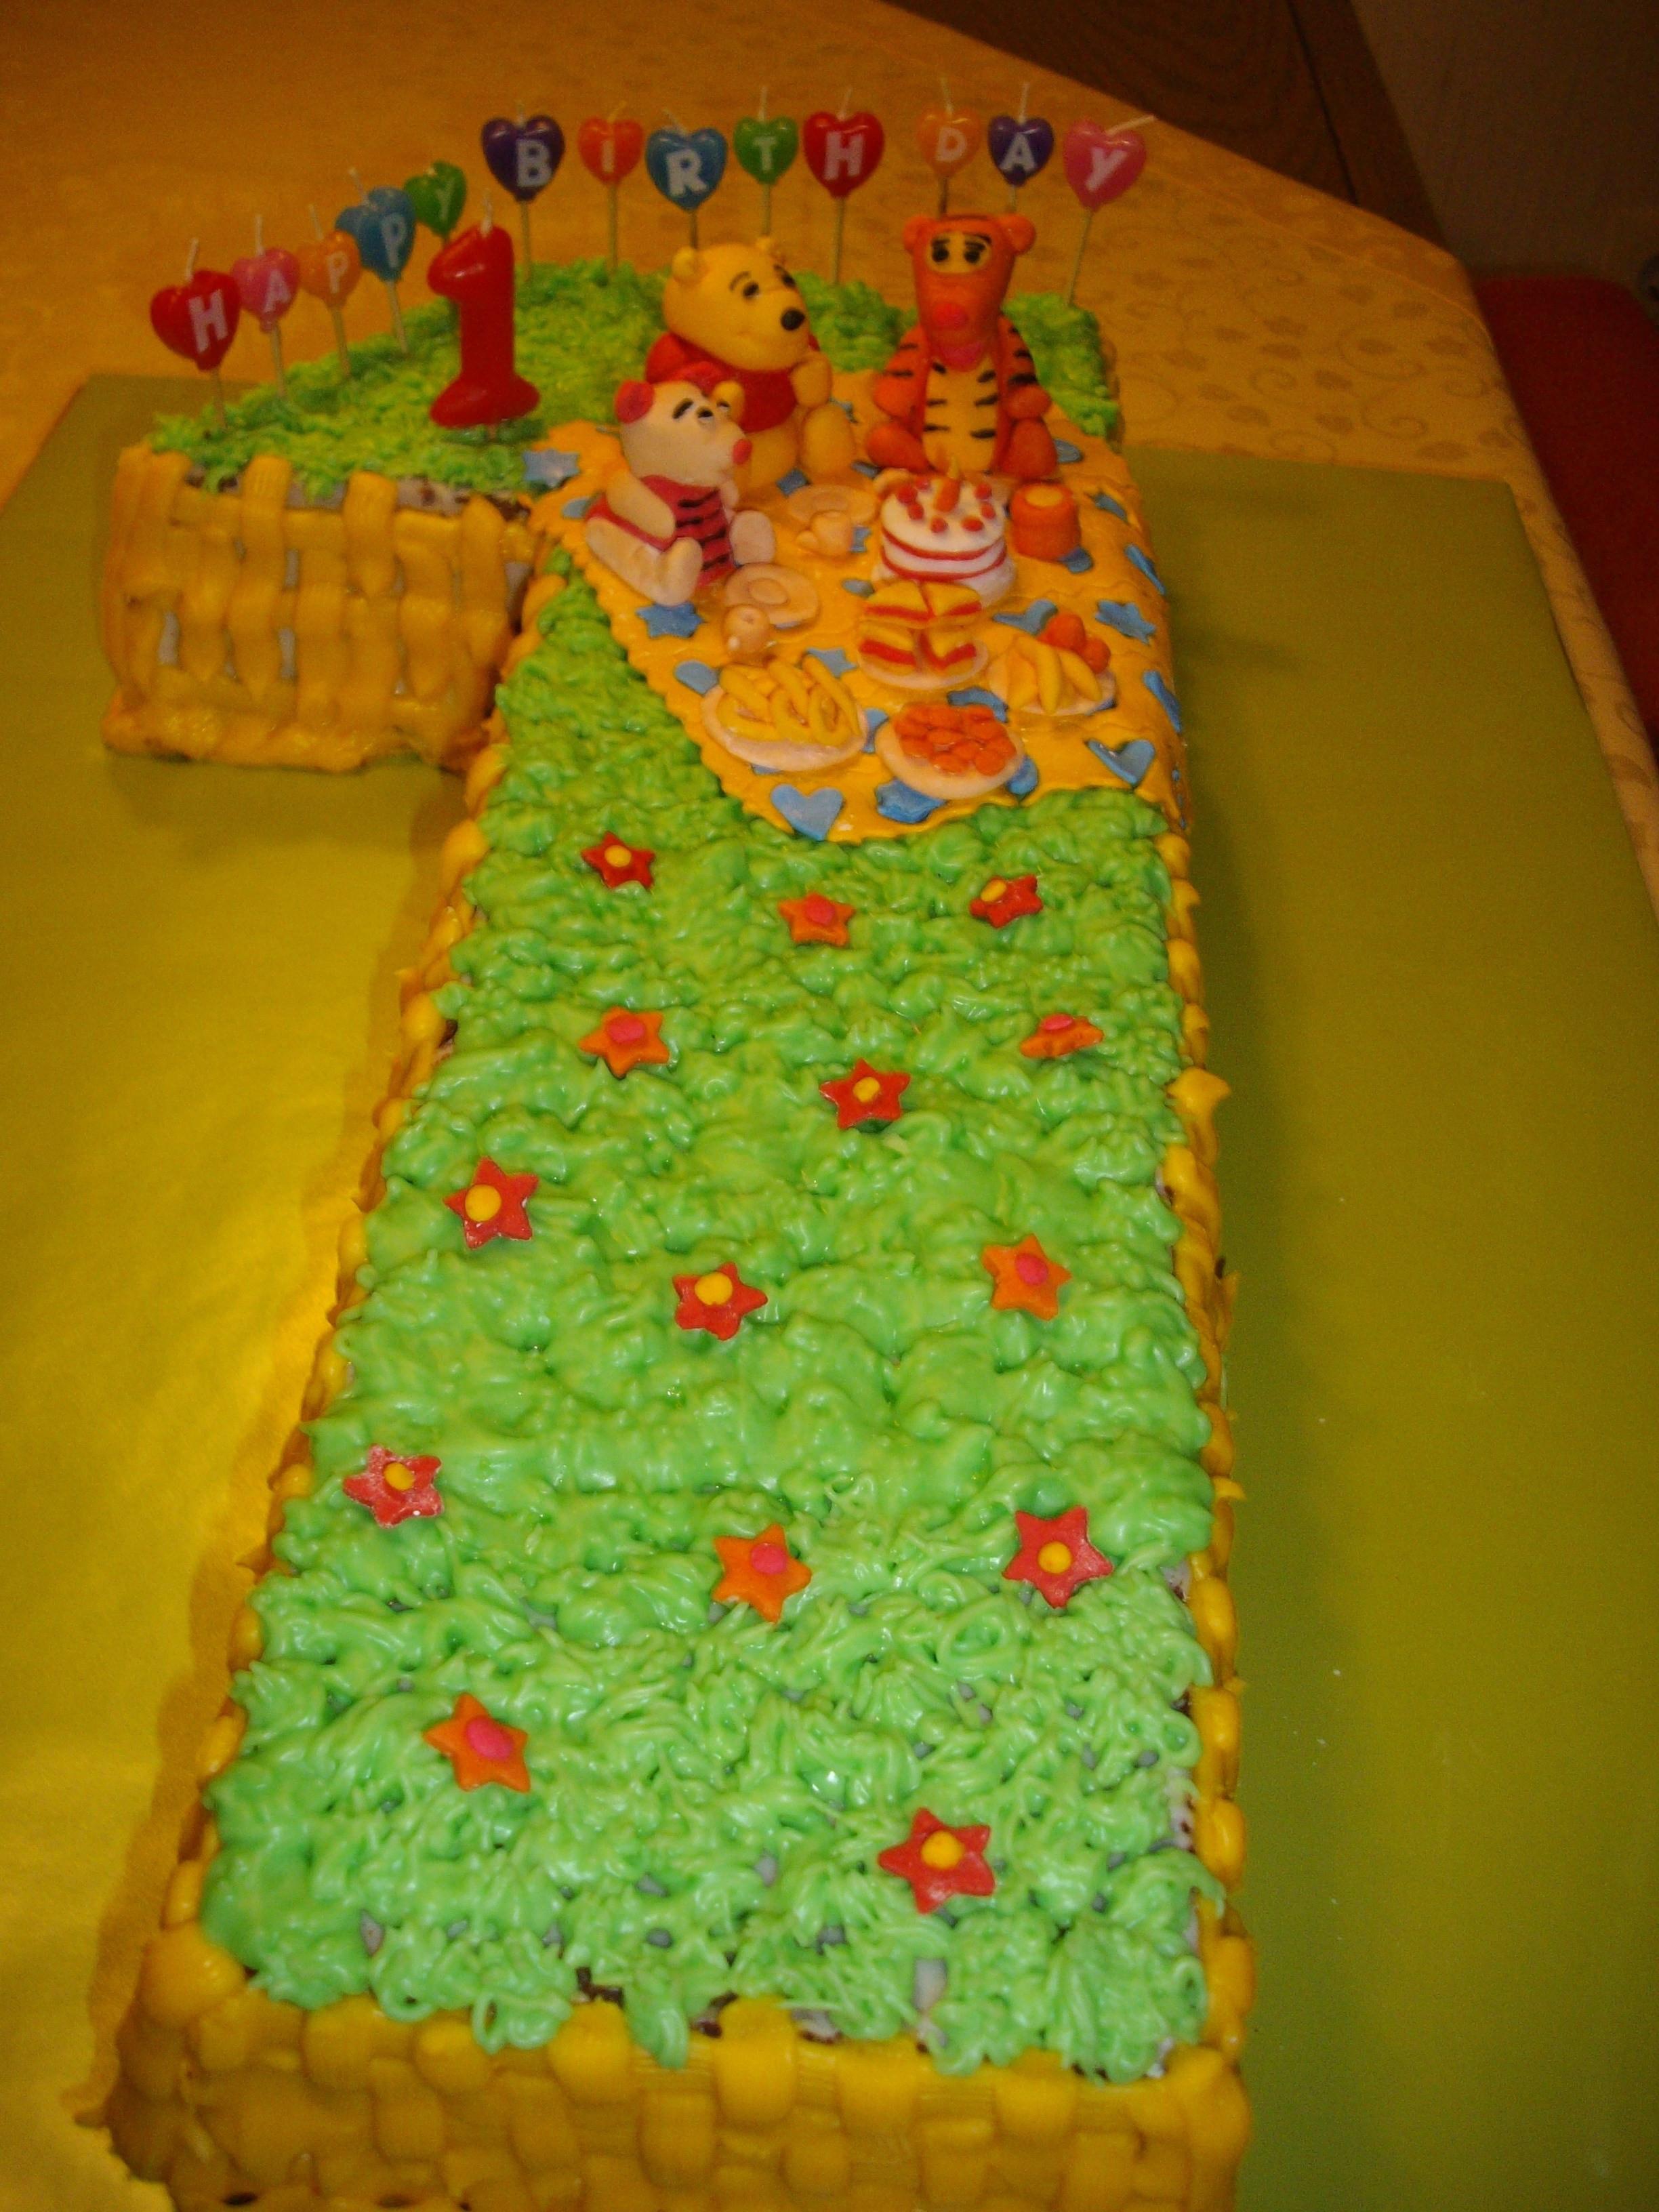 Geburtstagstorte 1 Jahr  Geburtstagstorte 1 Jahr Rezept Geburtstagstorte